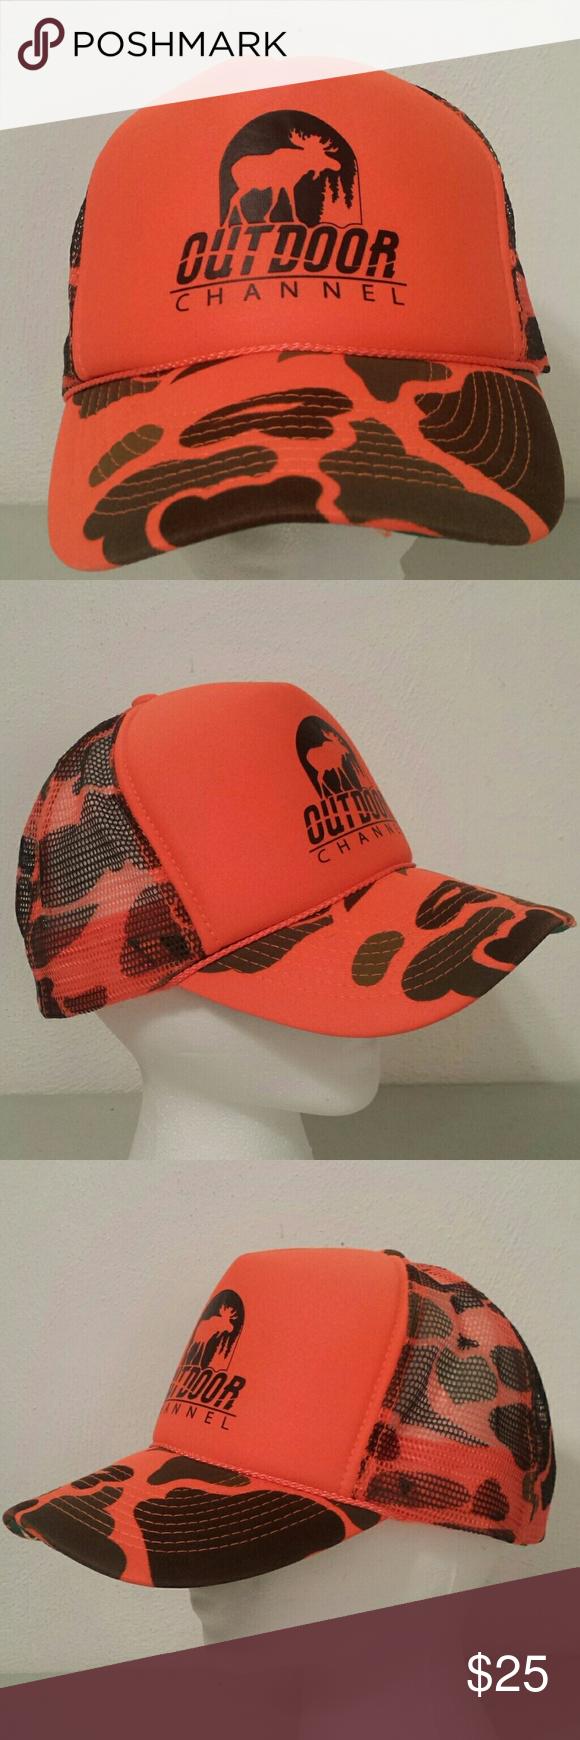 Orange Camoflauge Outdoor Channel Snapback Hat Snapback Hats Hats Camoflauge